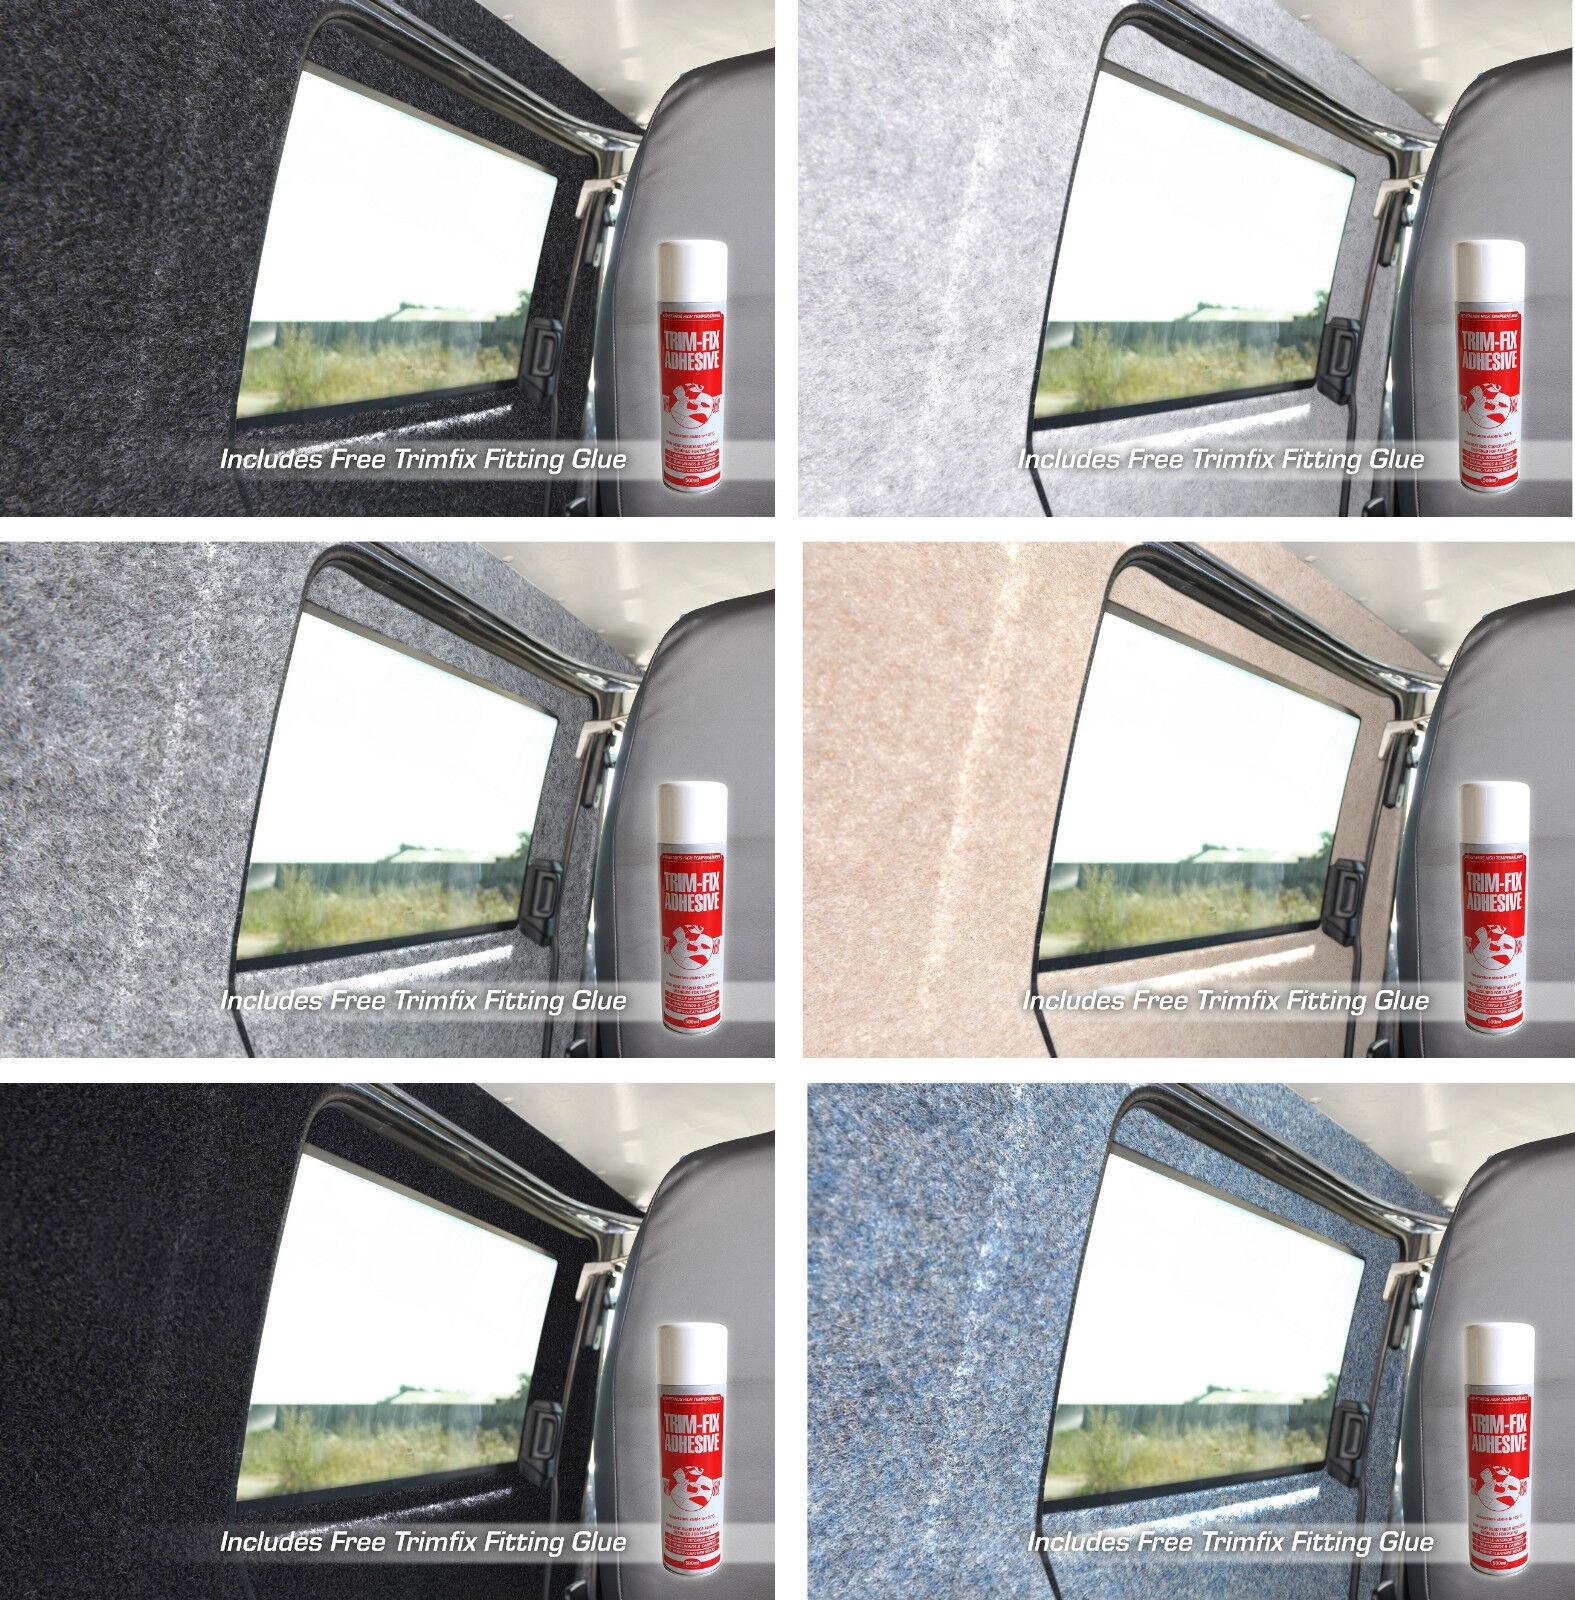 Car Parts - Various Size Van Lining Carpet Kit Super Stretch Inc Trimfix Spray Glue Camper